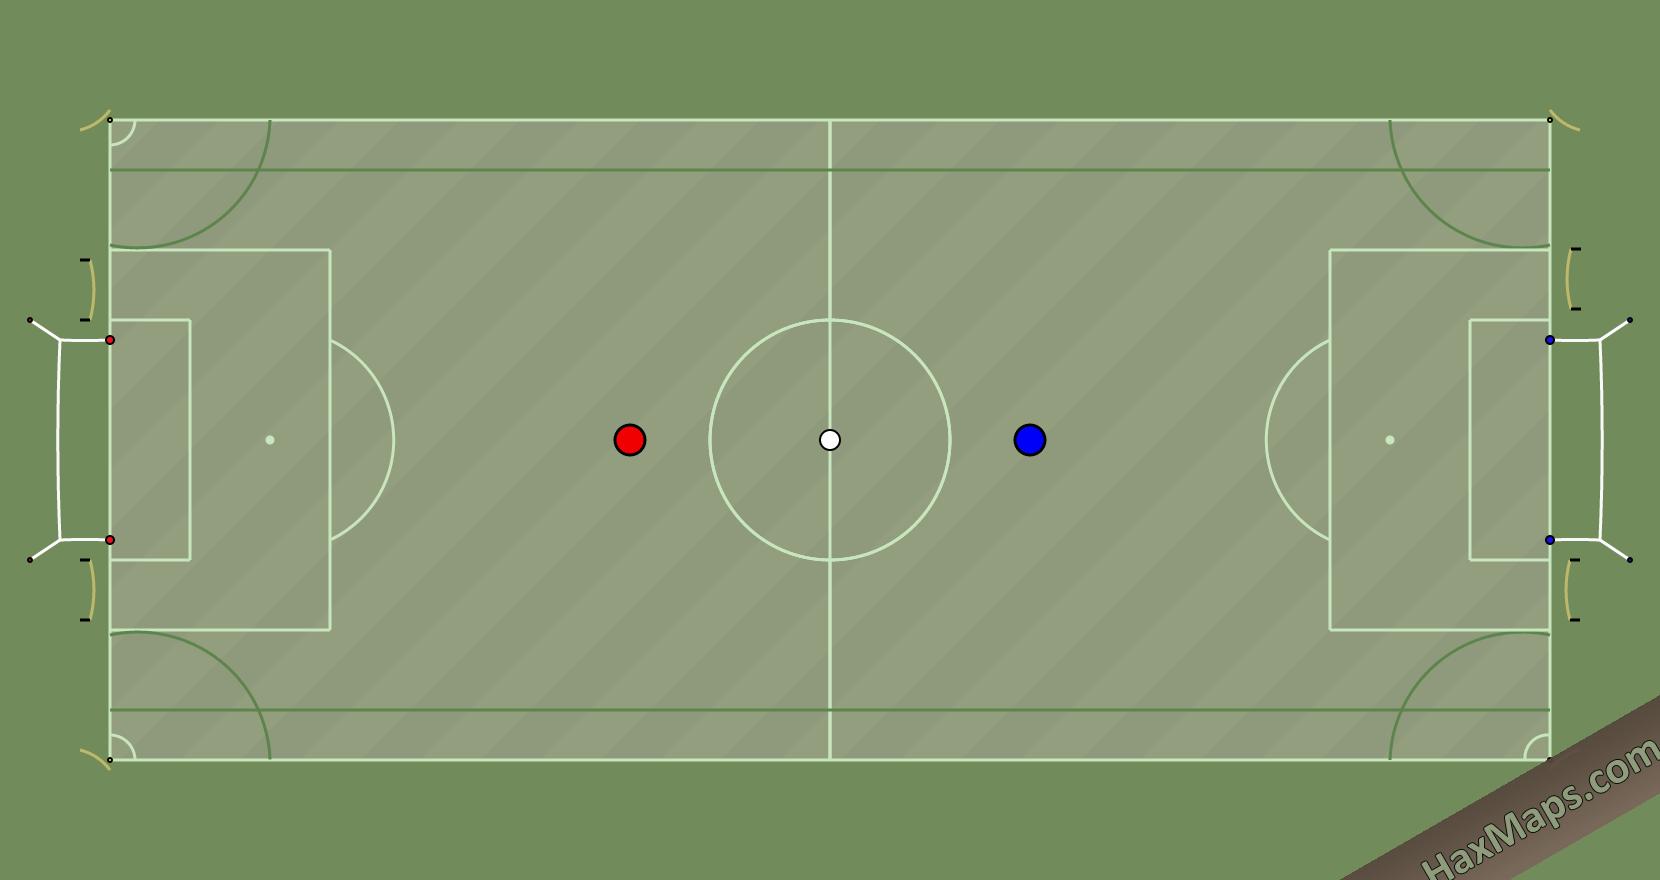 hax ball maps | football 3D